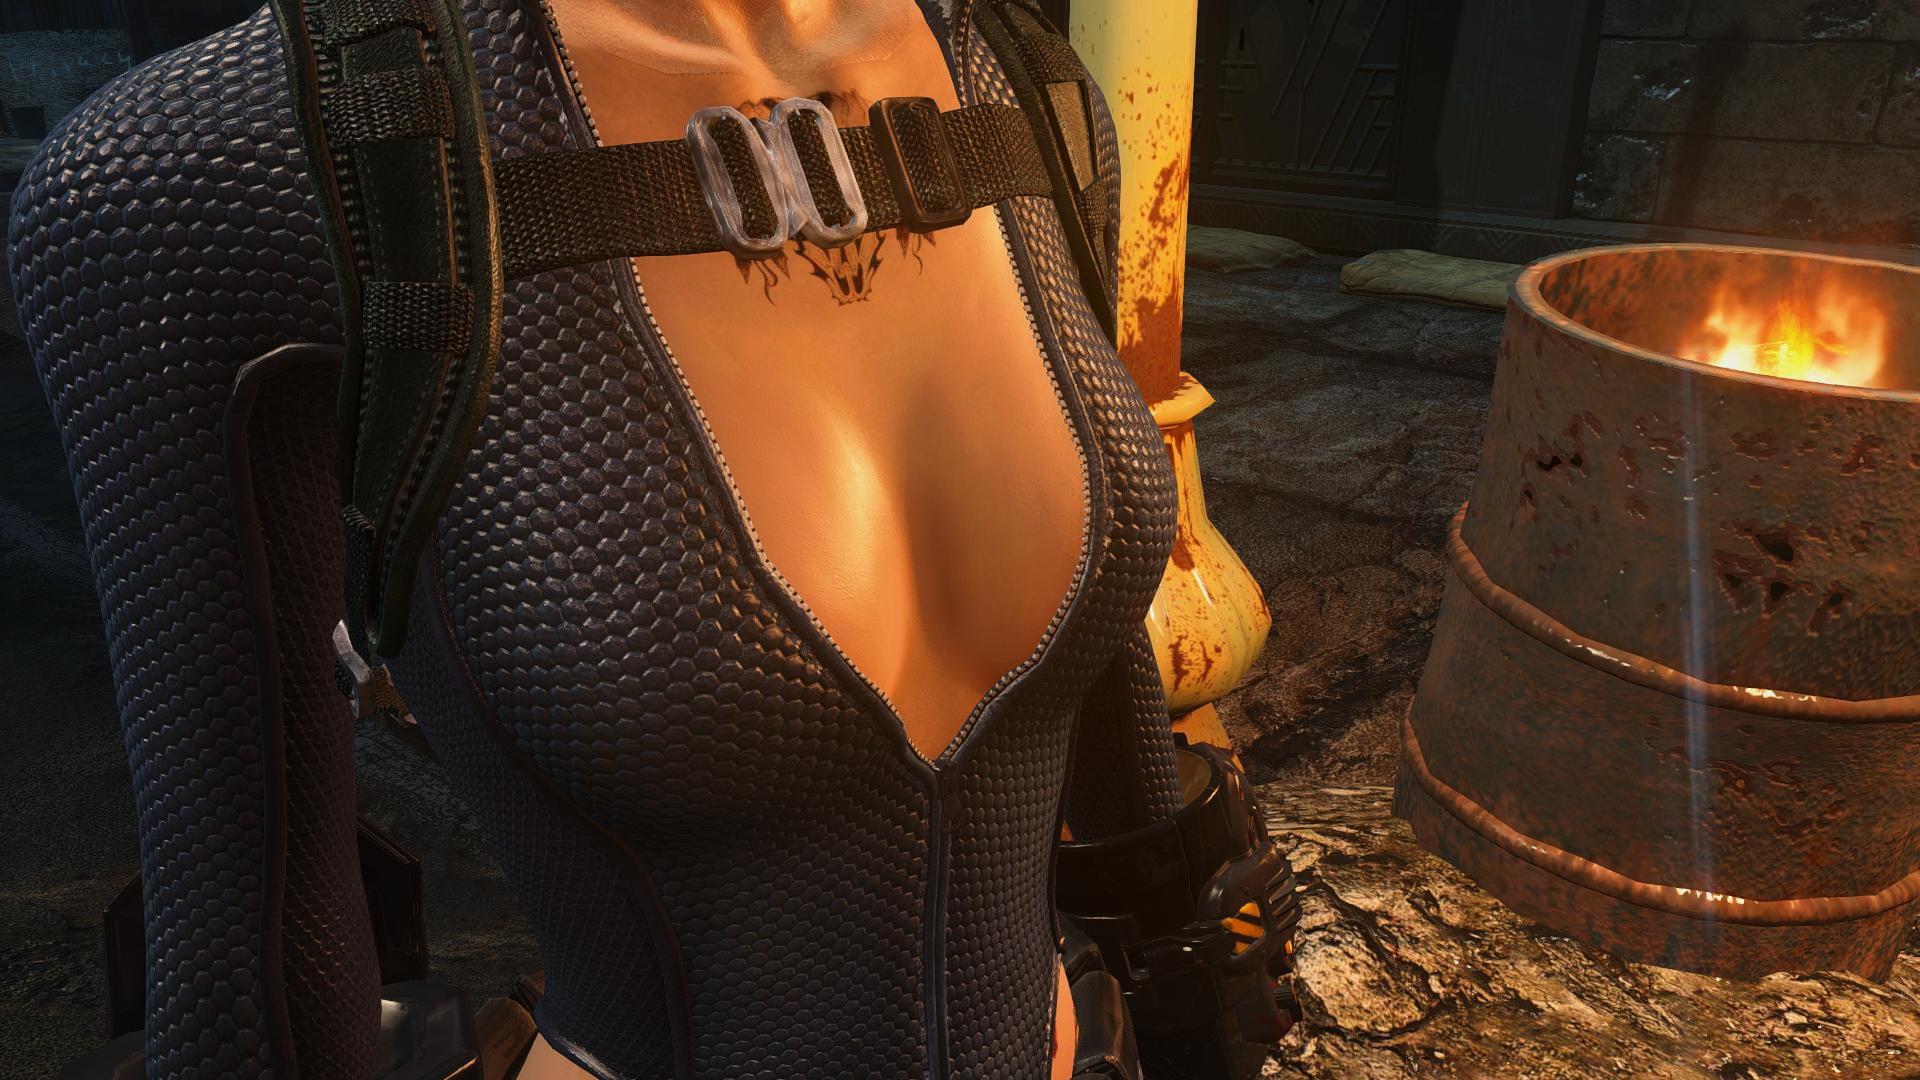 000593.Jpg - Fallout 4